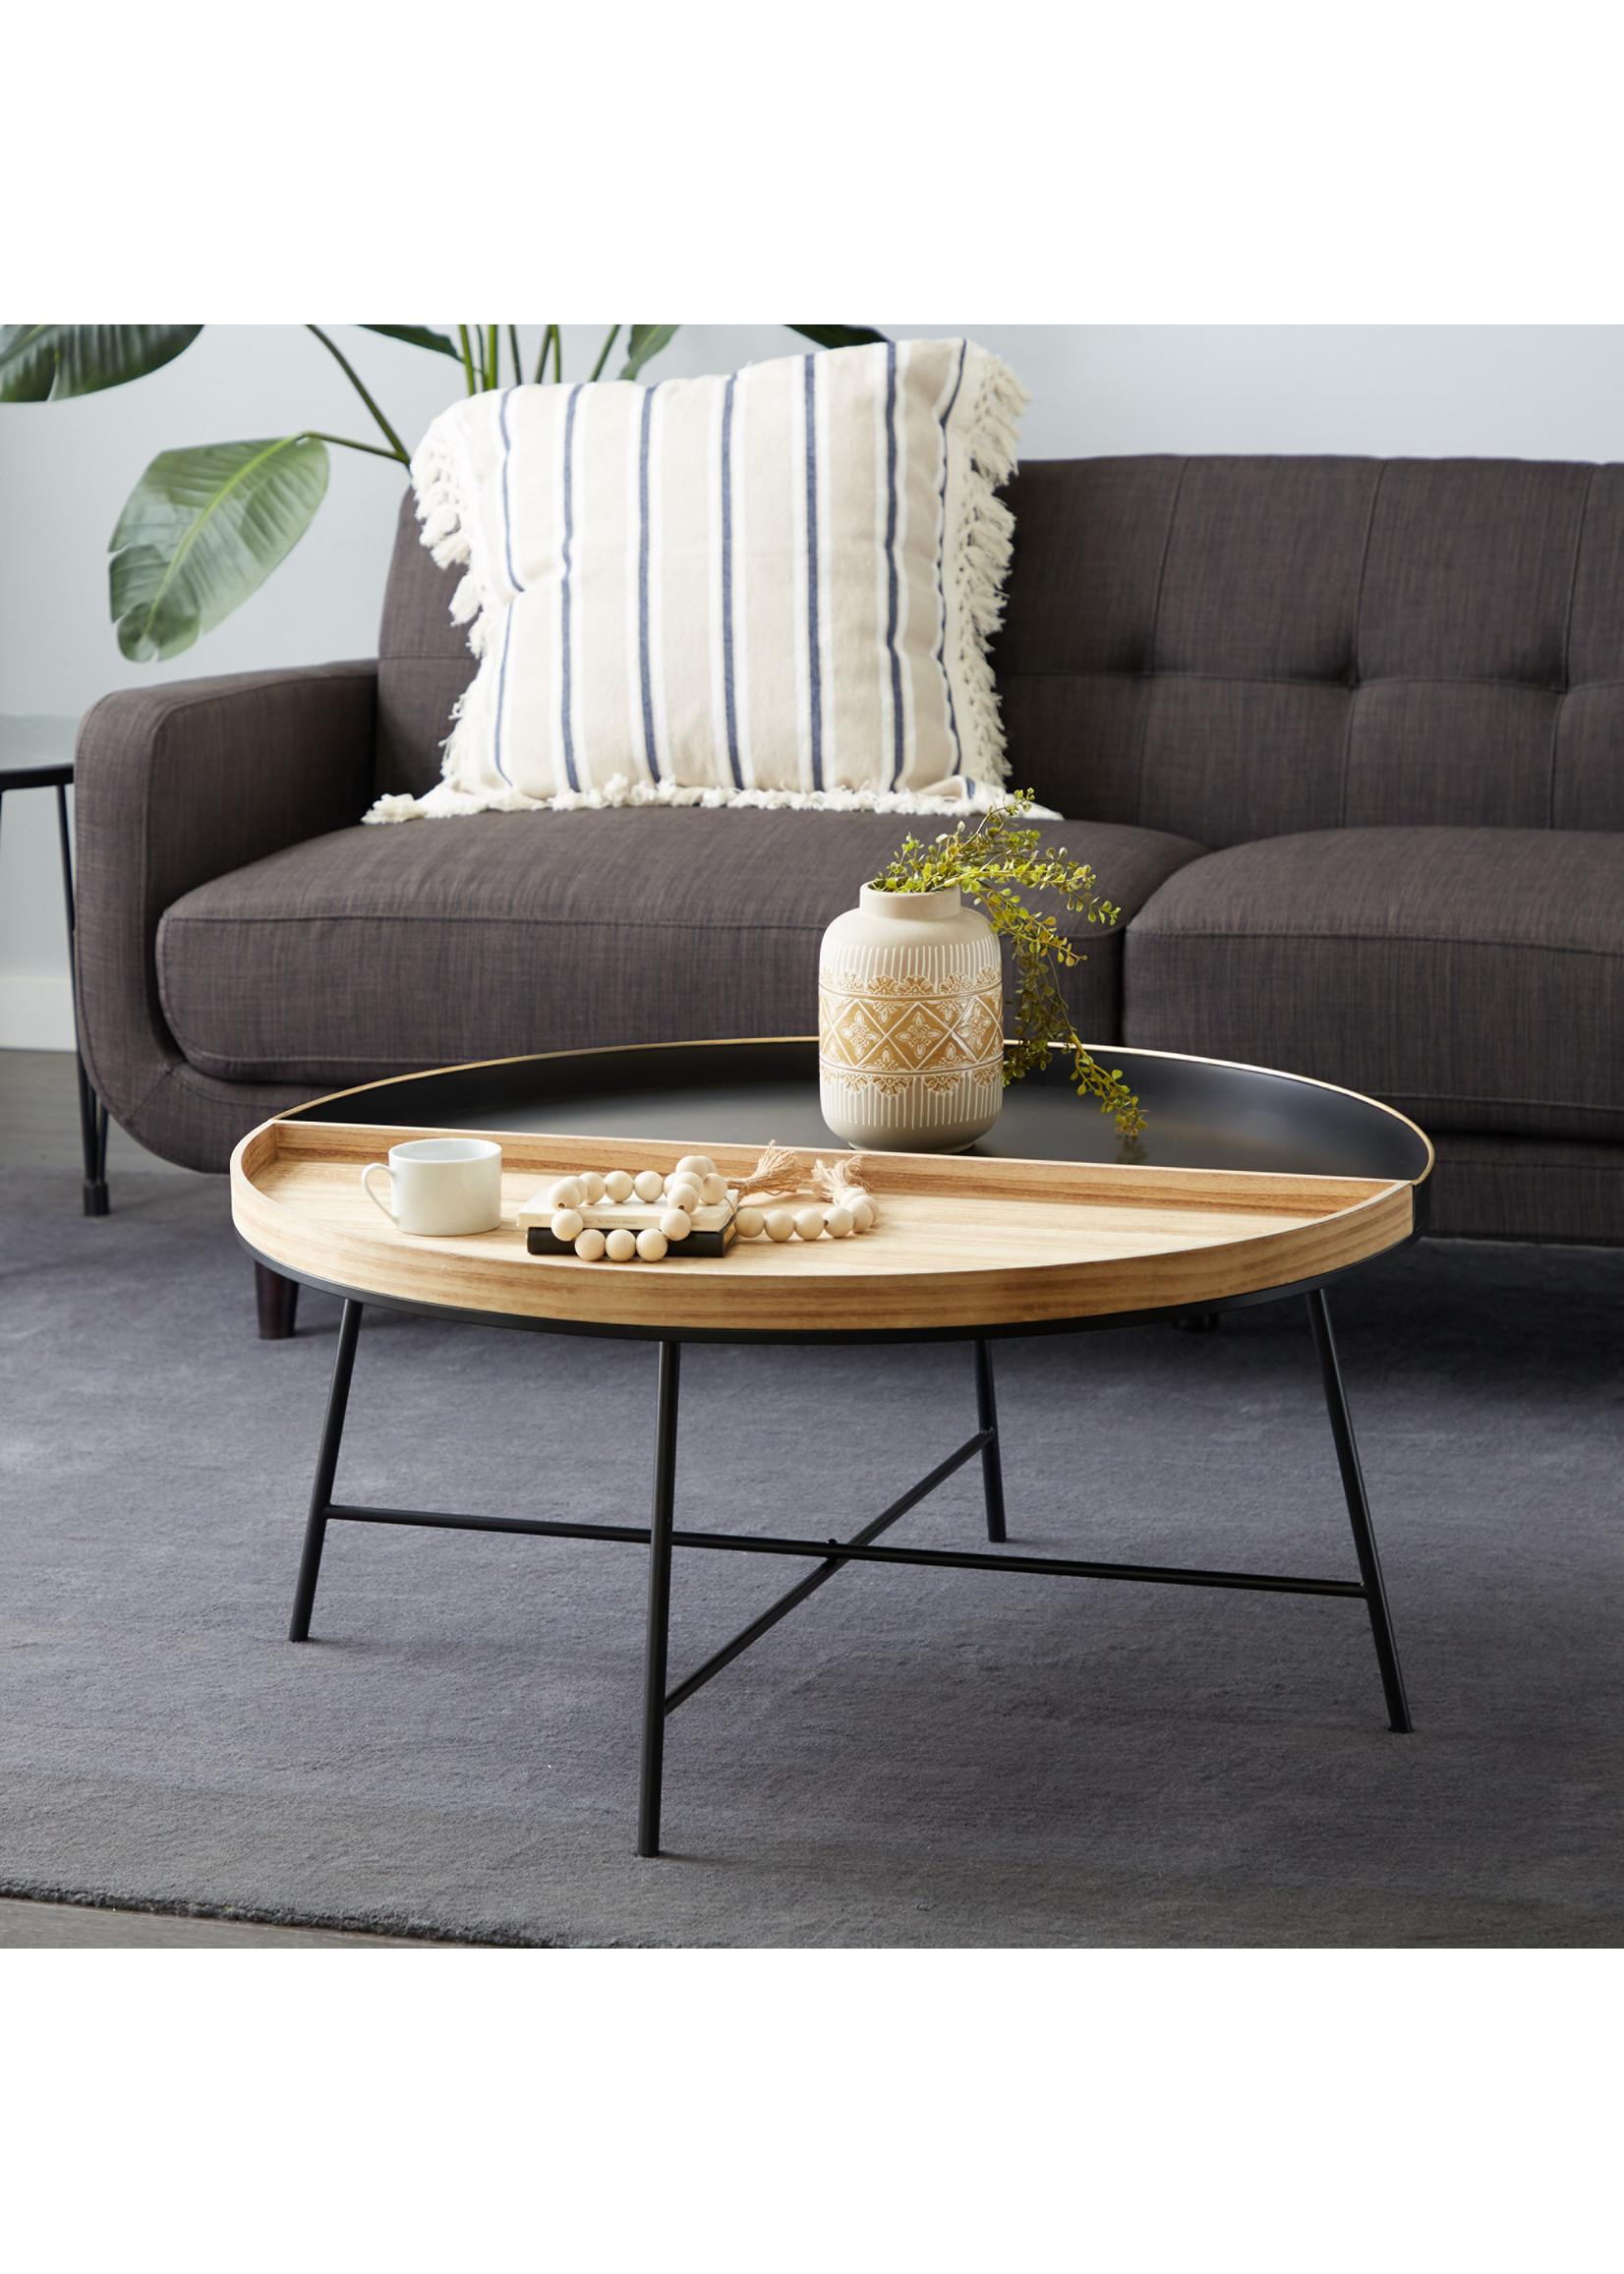 UMA Enterprises UMA Wood Metal Coffee Table